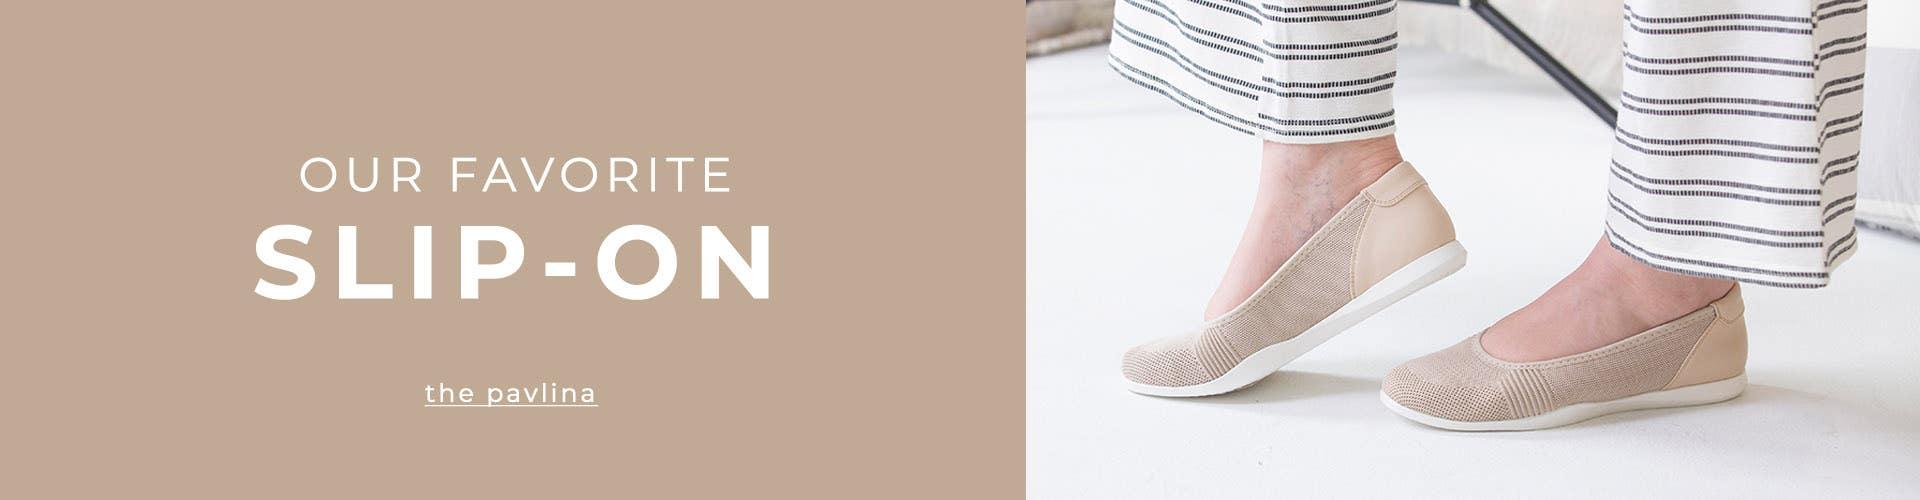 Our Favorite Slip-On | the Pavlina